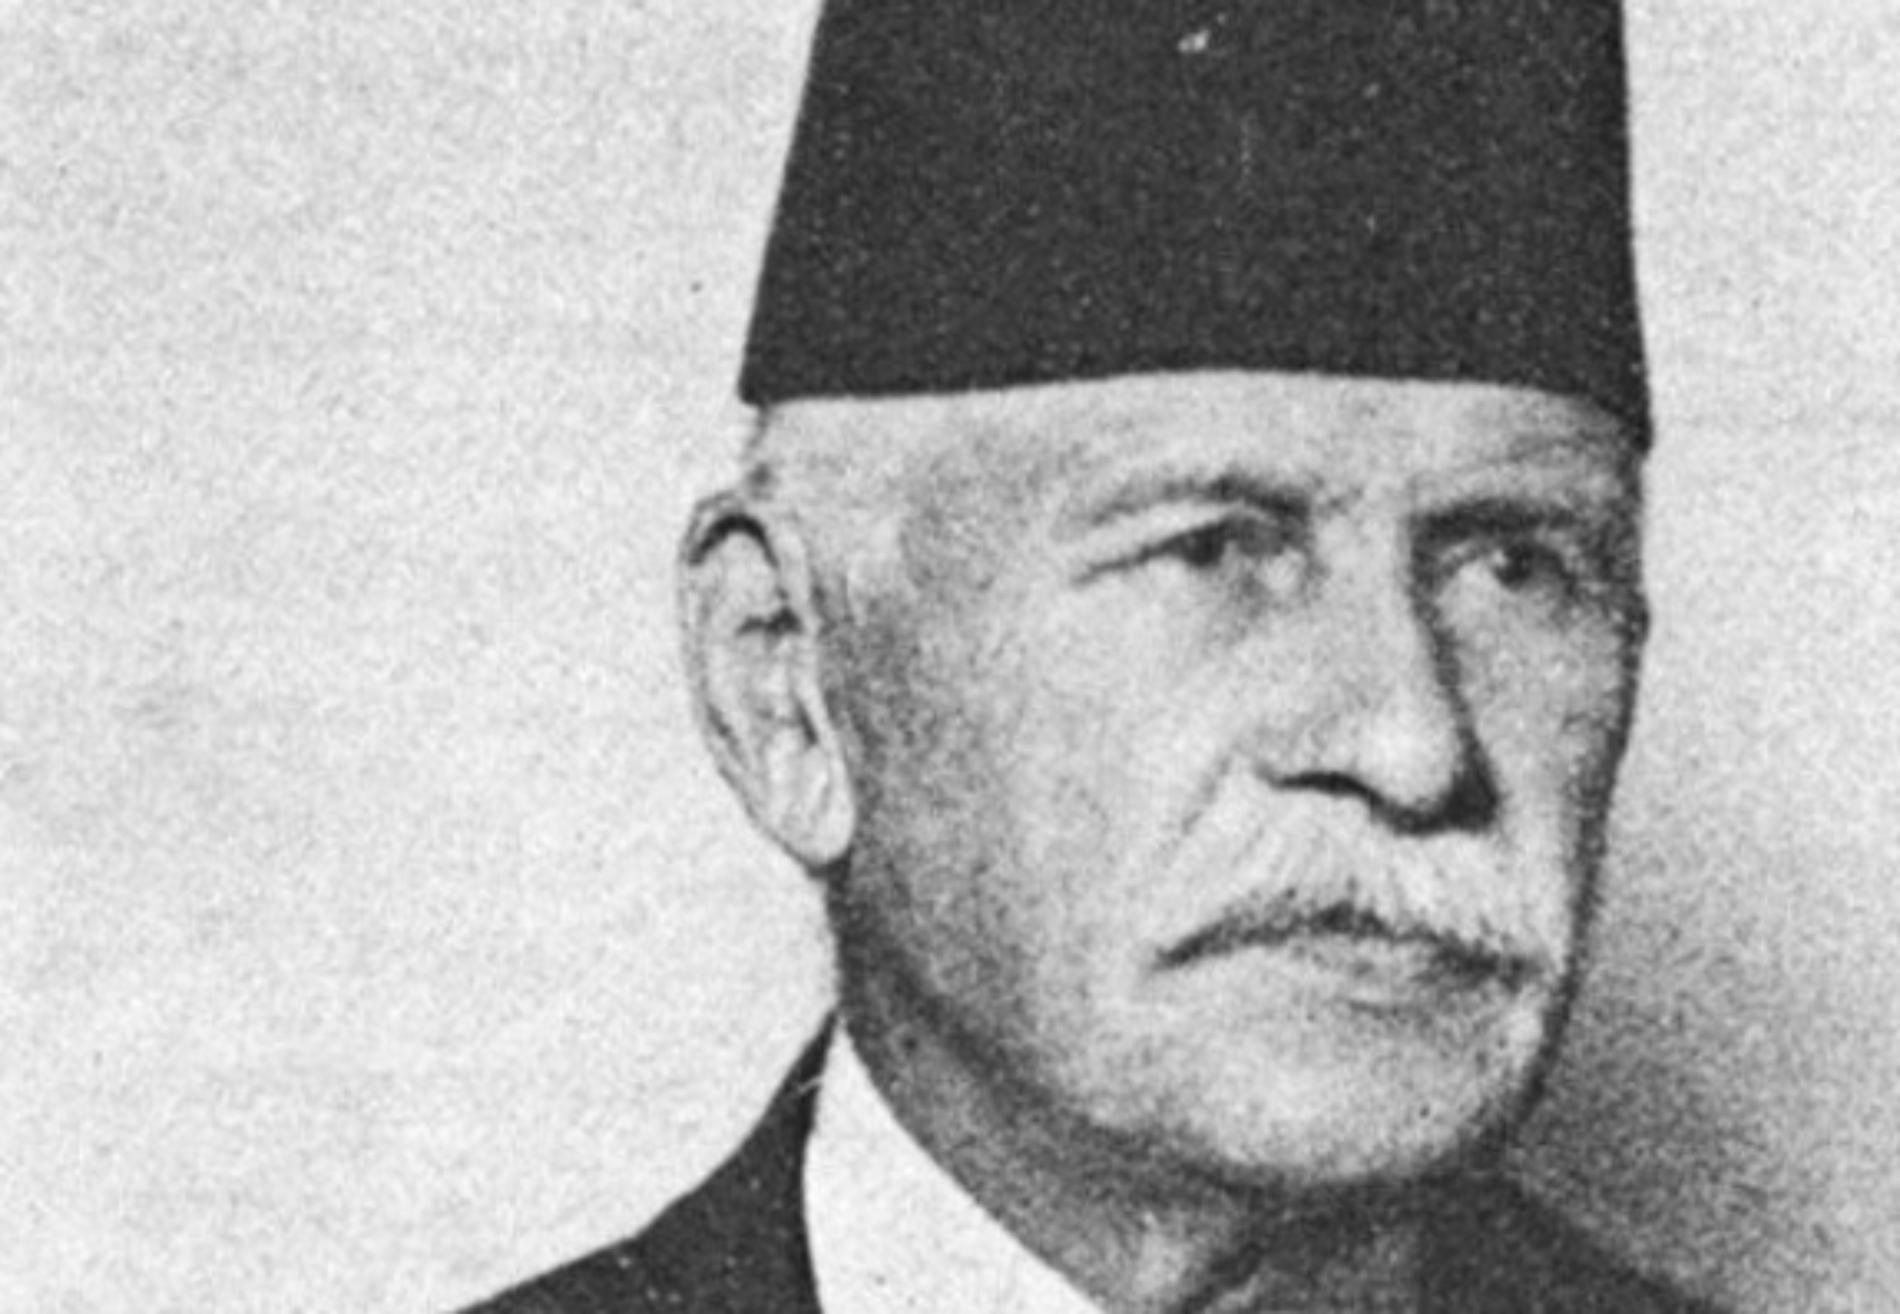 Pišem ti o Edhemu Mulabdiću da ga ne zaboraviš